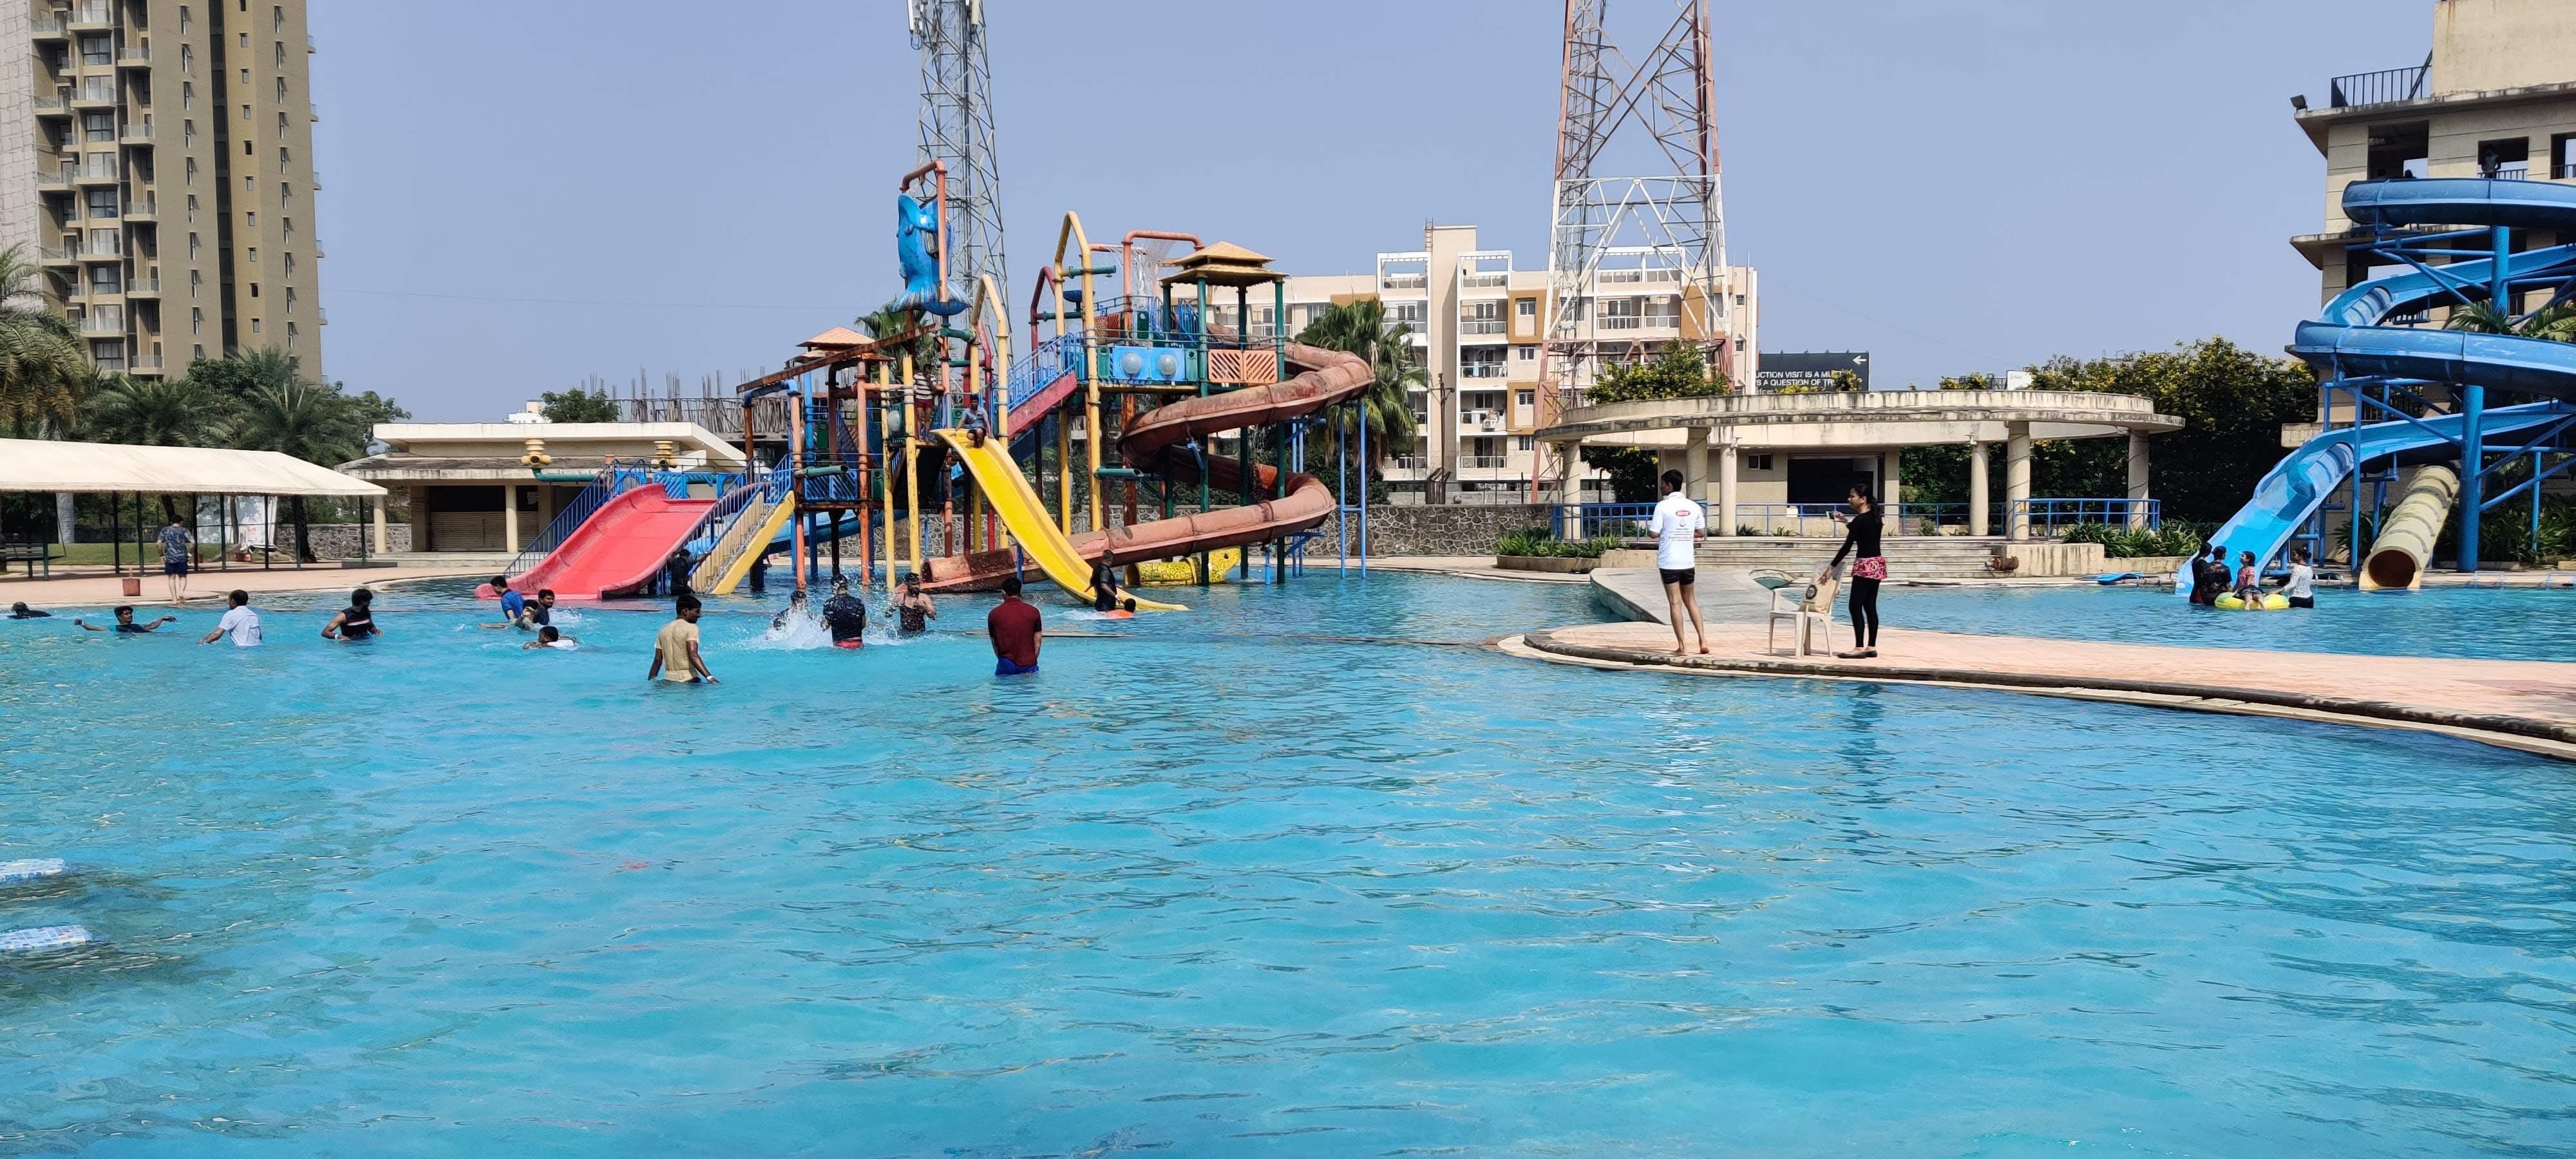 Swimming pool,Water park,Leisure,Recreation,Amusement park,Fun,Vacation,Resort,Tourism,Leisure centre